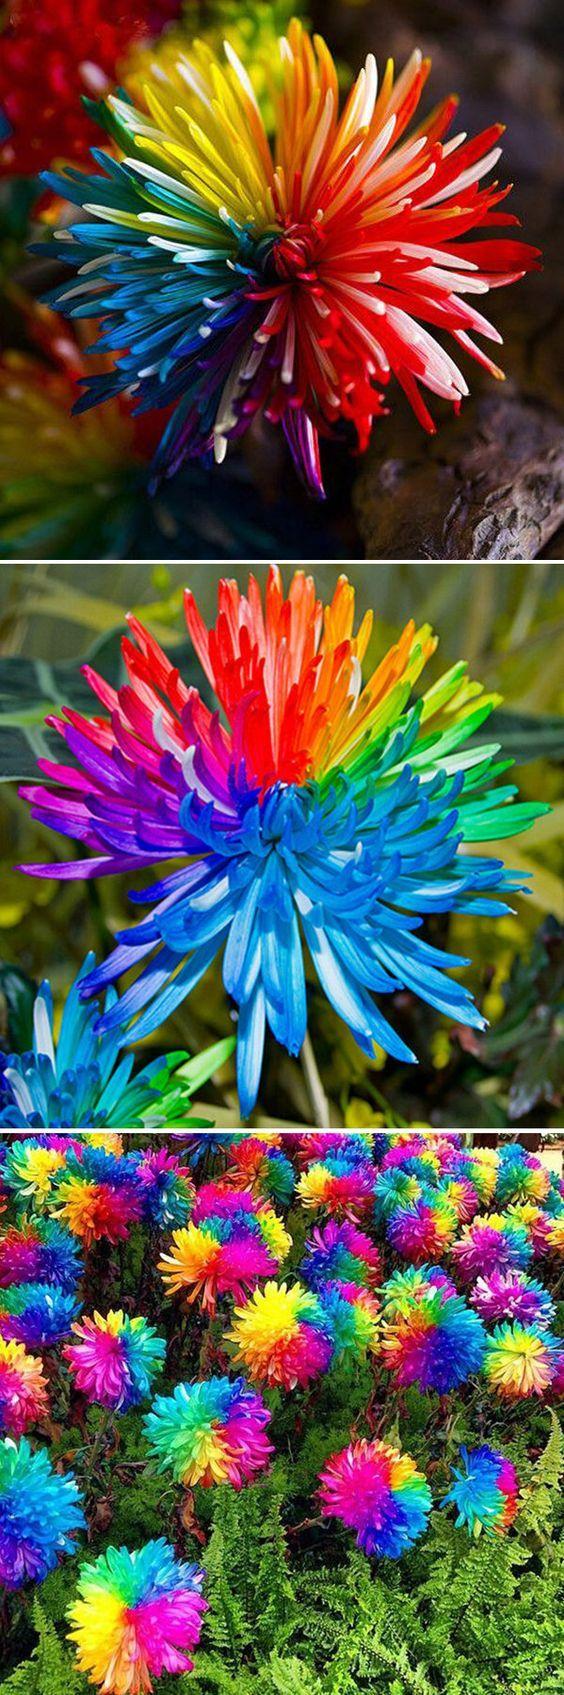 25 best ideas about rainbow flowers on pinterest for Rainbow flower seeds